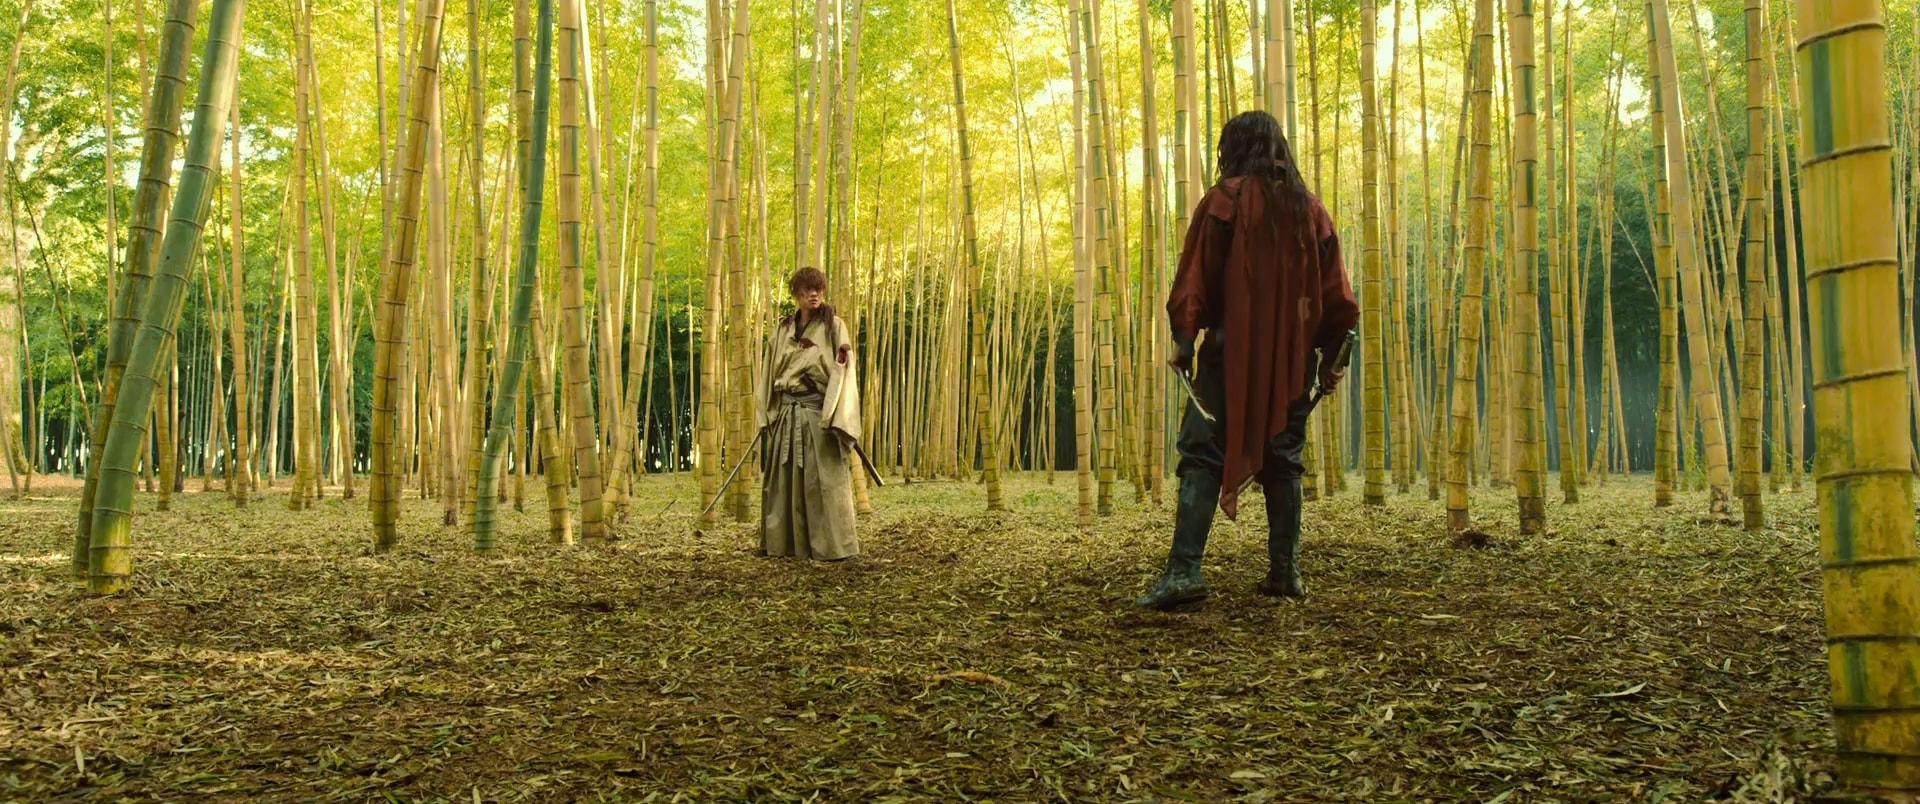 Rurouni Kenshin 3 Samurai X: La Leyenda Termina ∙ El Guerrero Samurái 3: El Fin de la Leyenda ∙ Rurouni Kenshin: Densetsu no Saigo hen ∙ Rurouni Kenshin: The Legend Ends